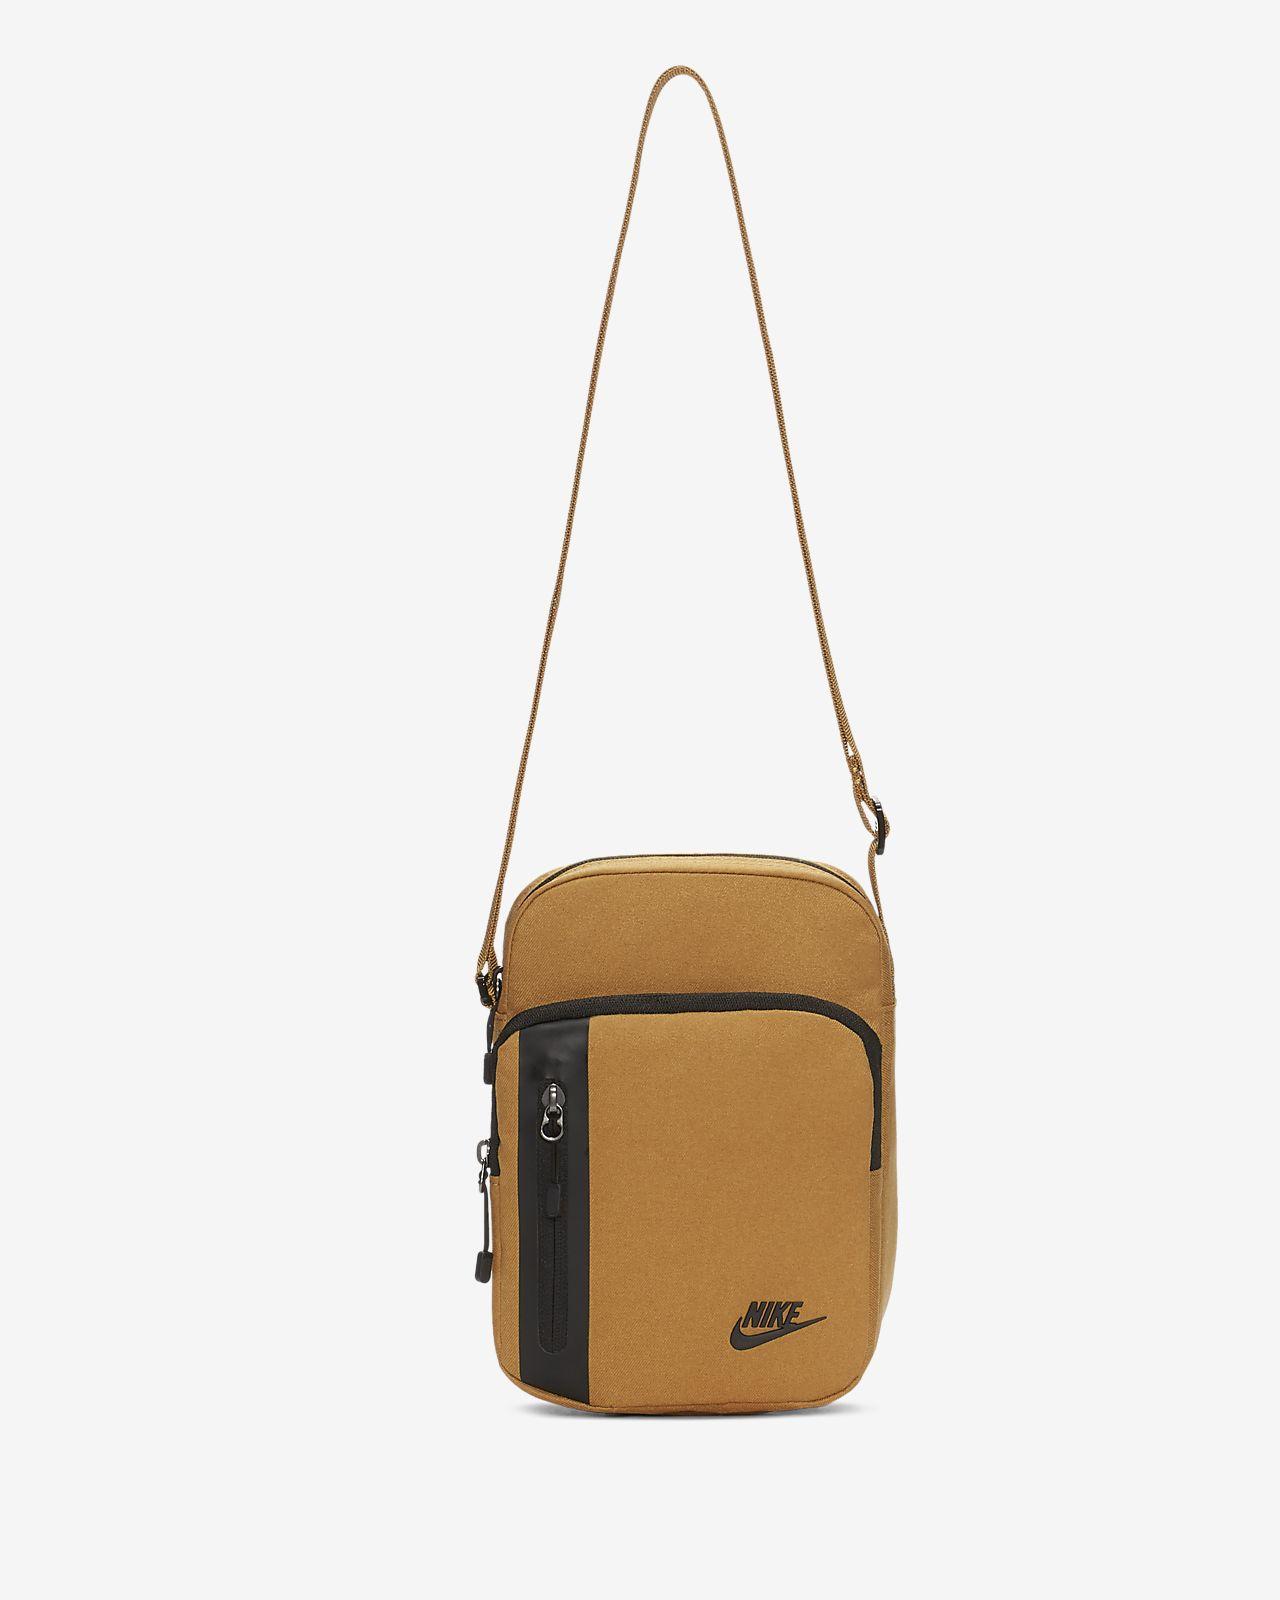 Väska Nike Core Small Items 3.0